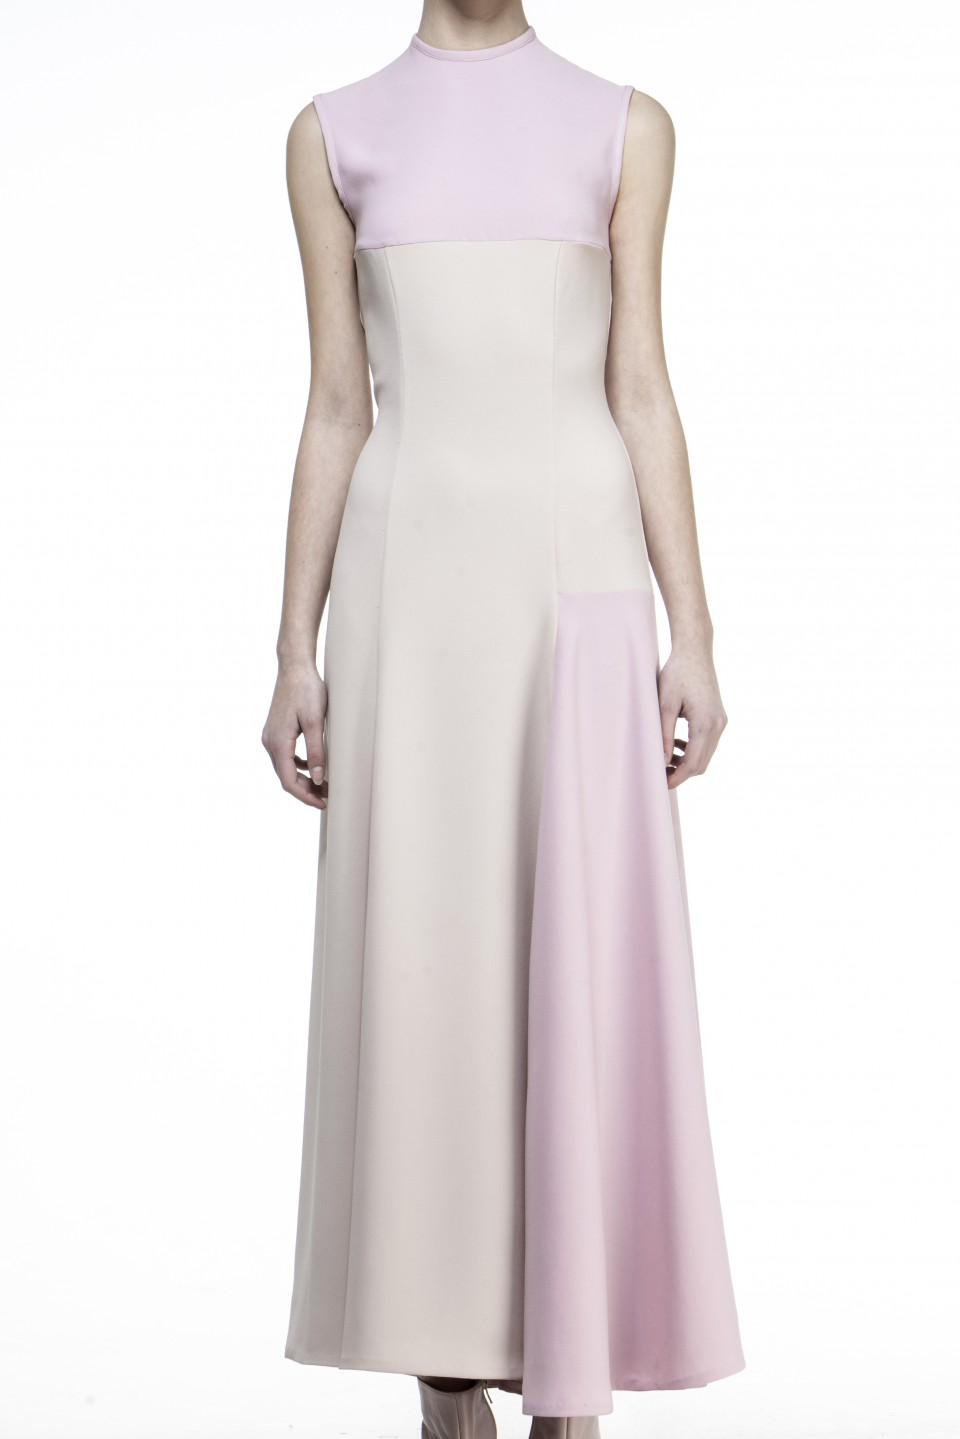 Atelier Kikala Dress 4